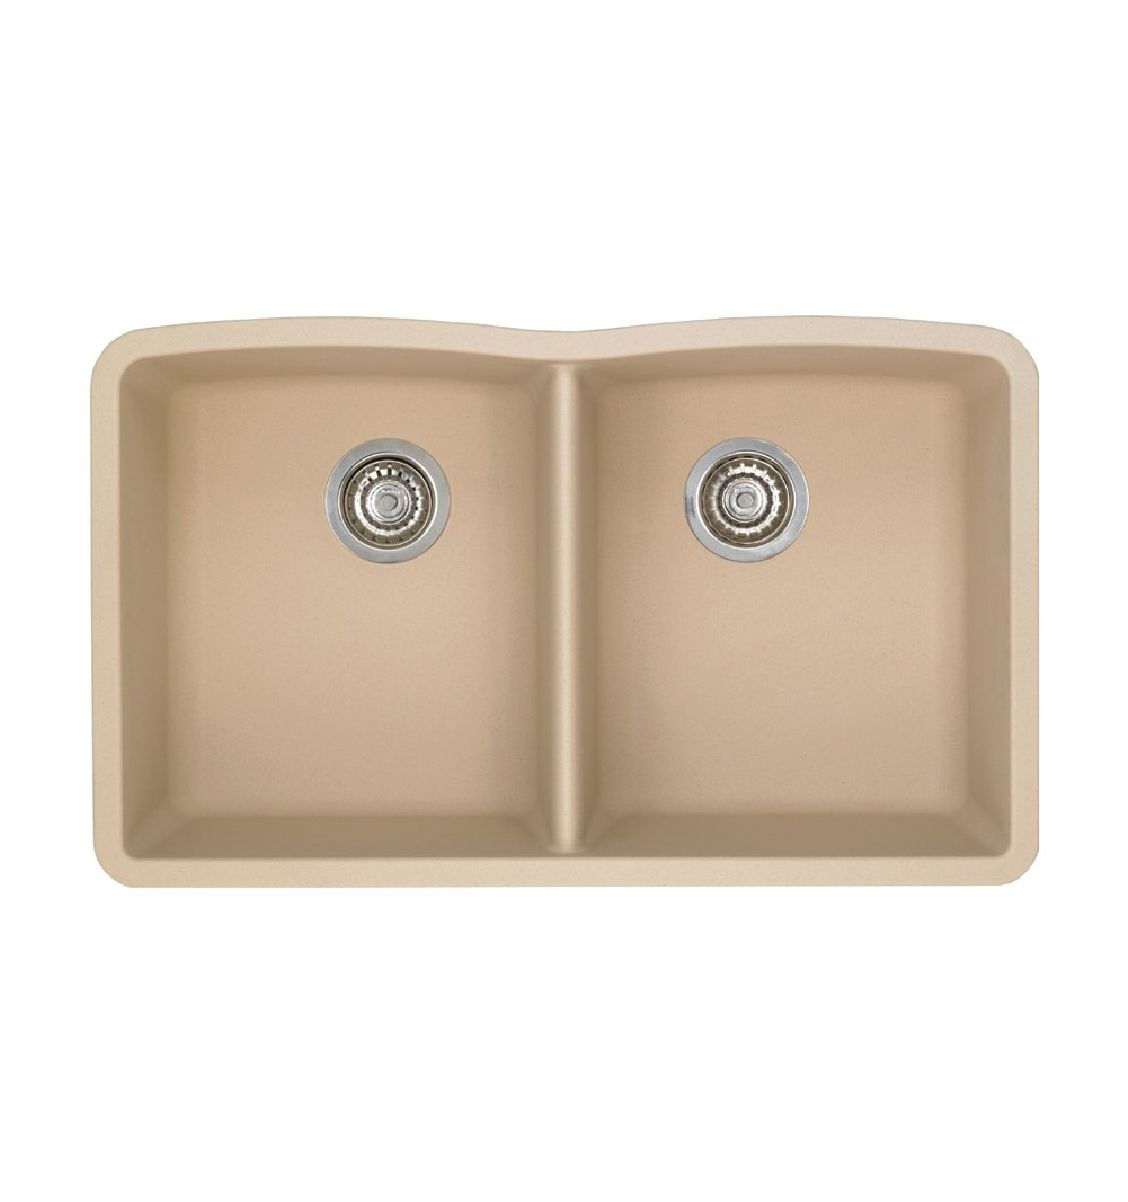 Best Blanco 441223 Diamond Silgranit Ii Equal Double Bowl 400 x 300